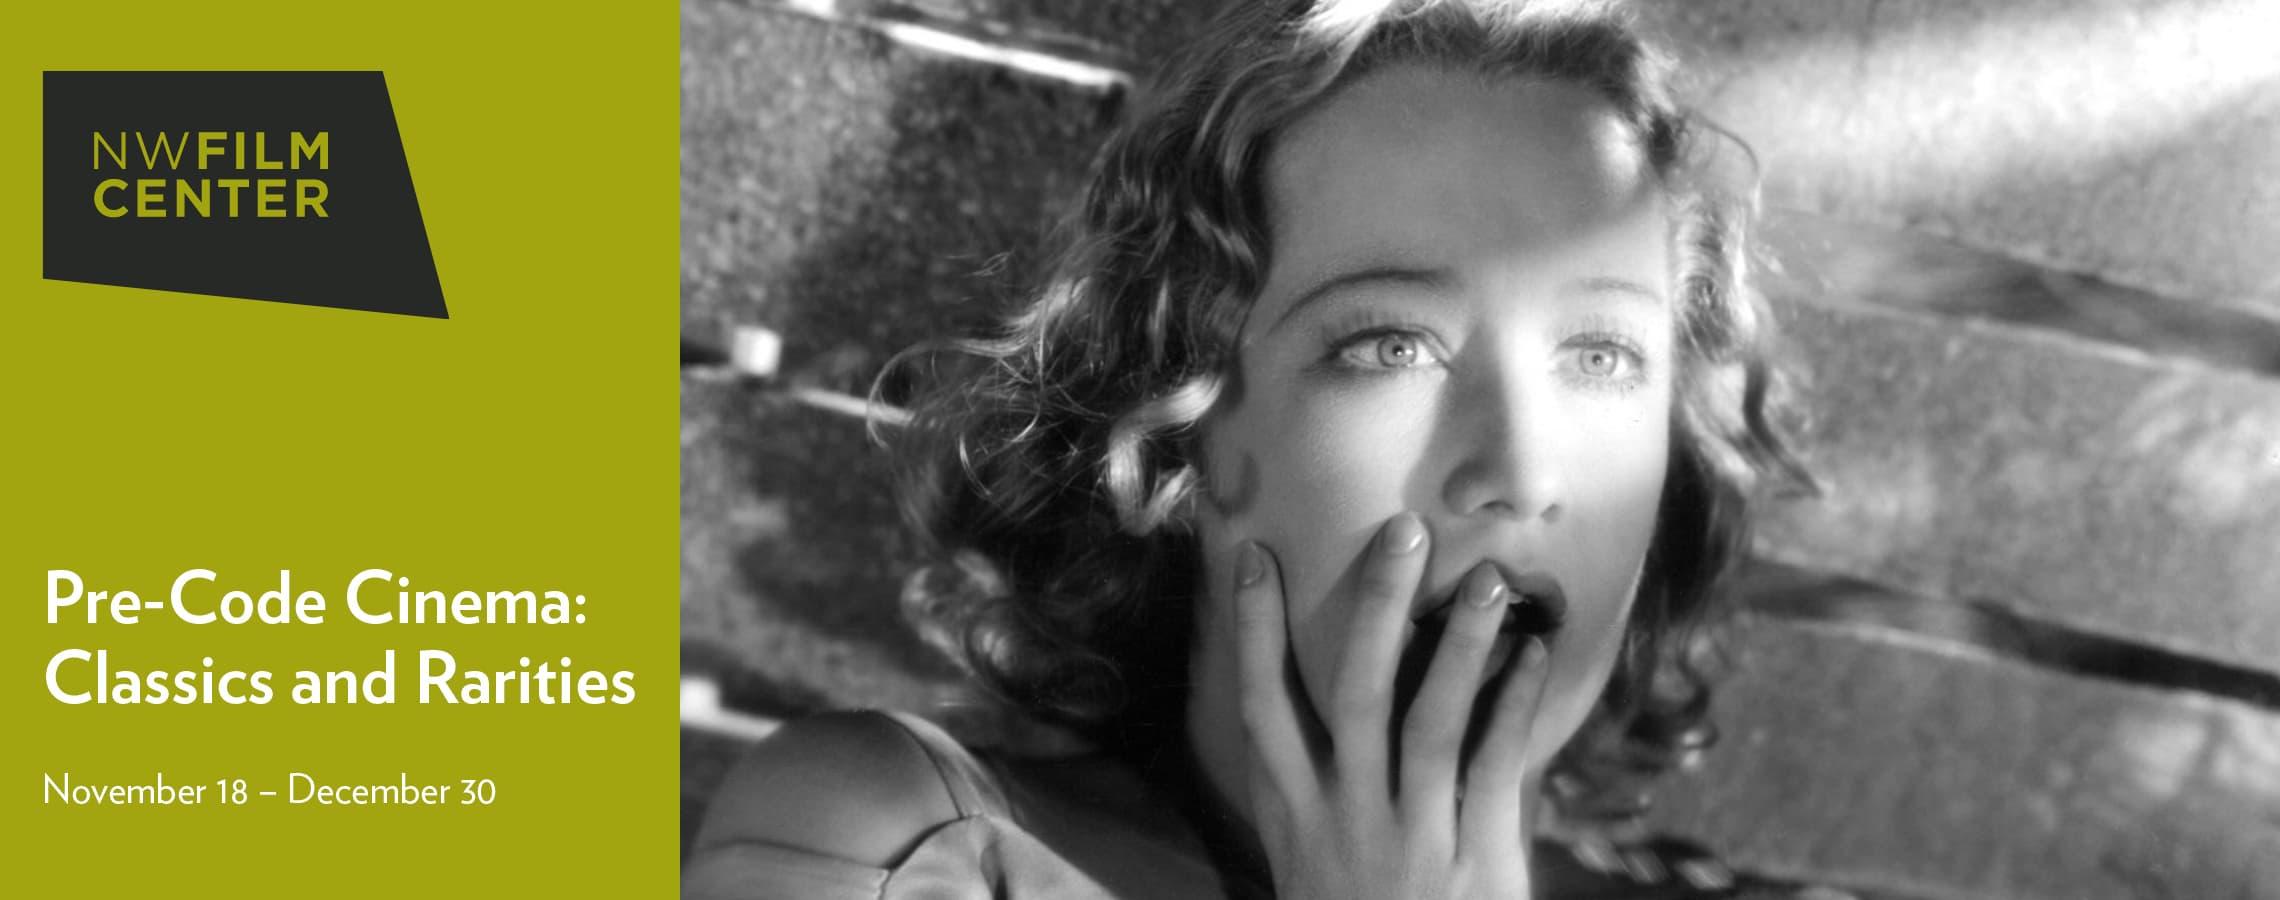 Pre-Code Cinema: Classics and Rarities; November 18 – December 30